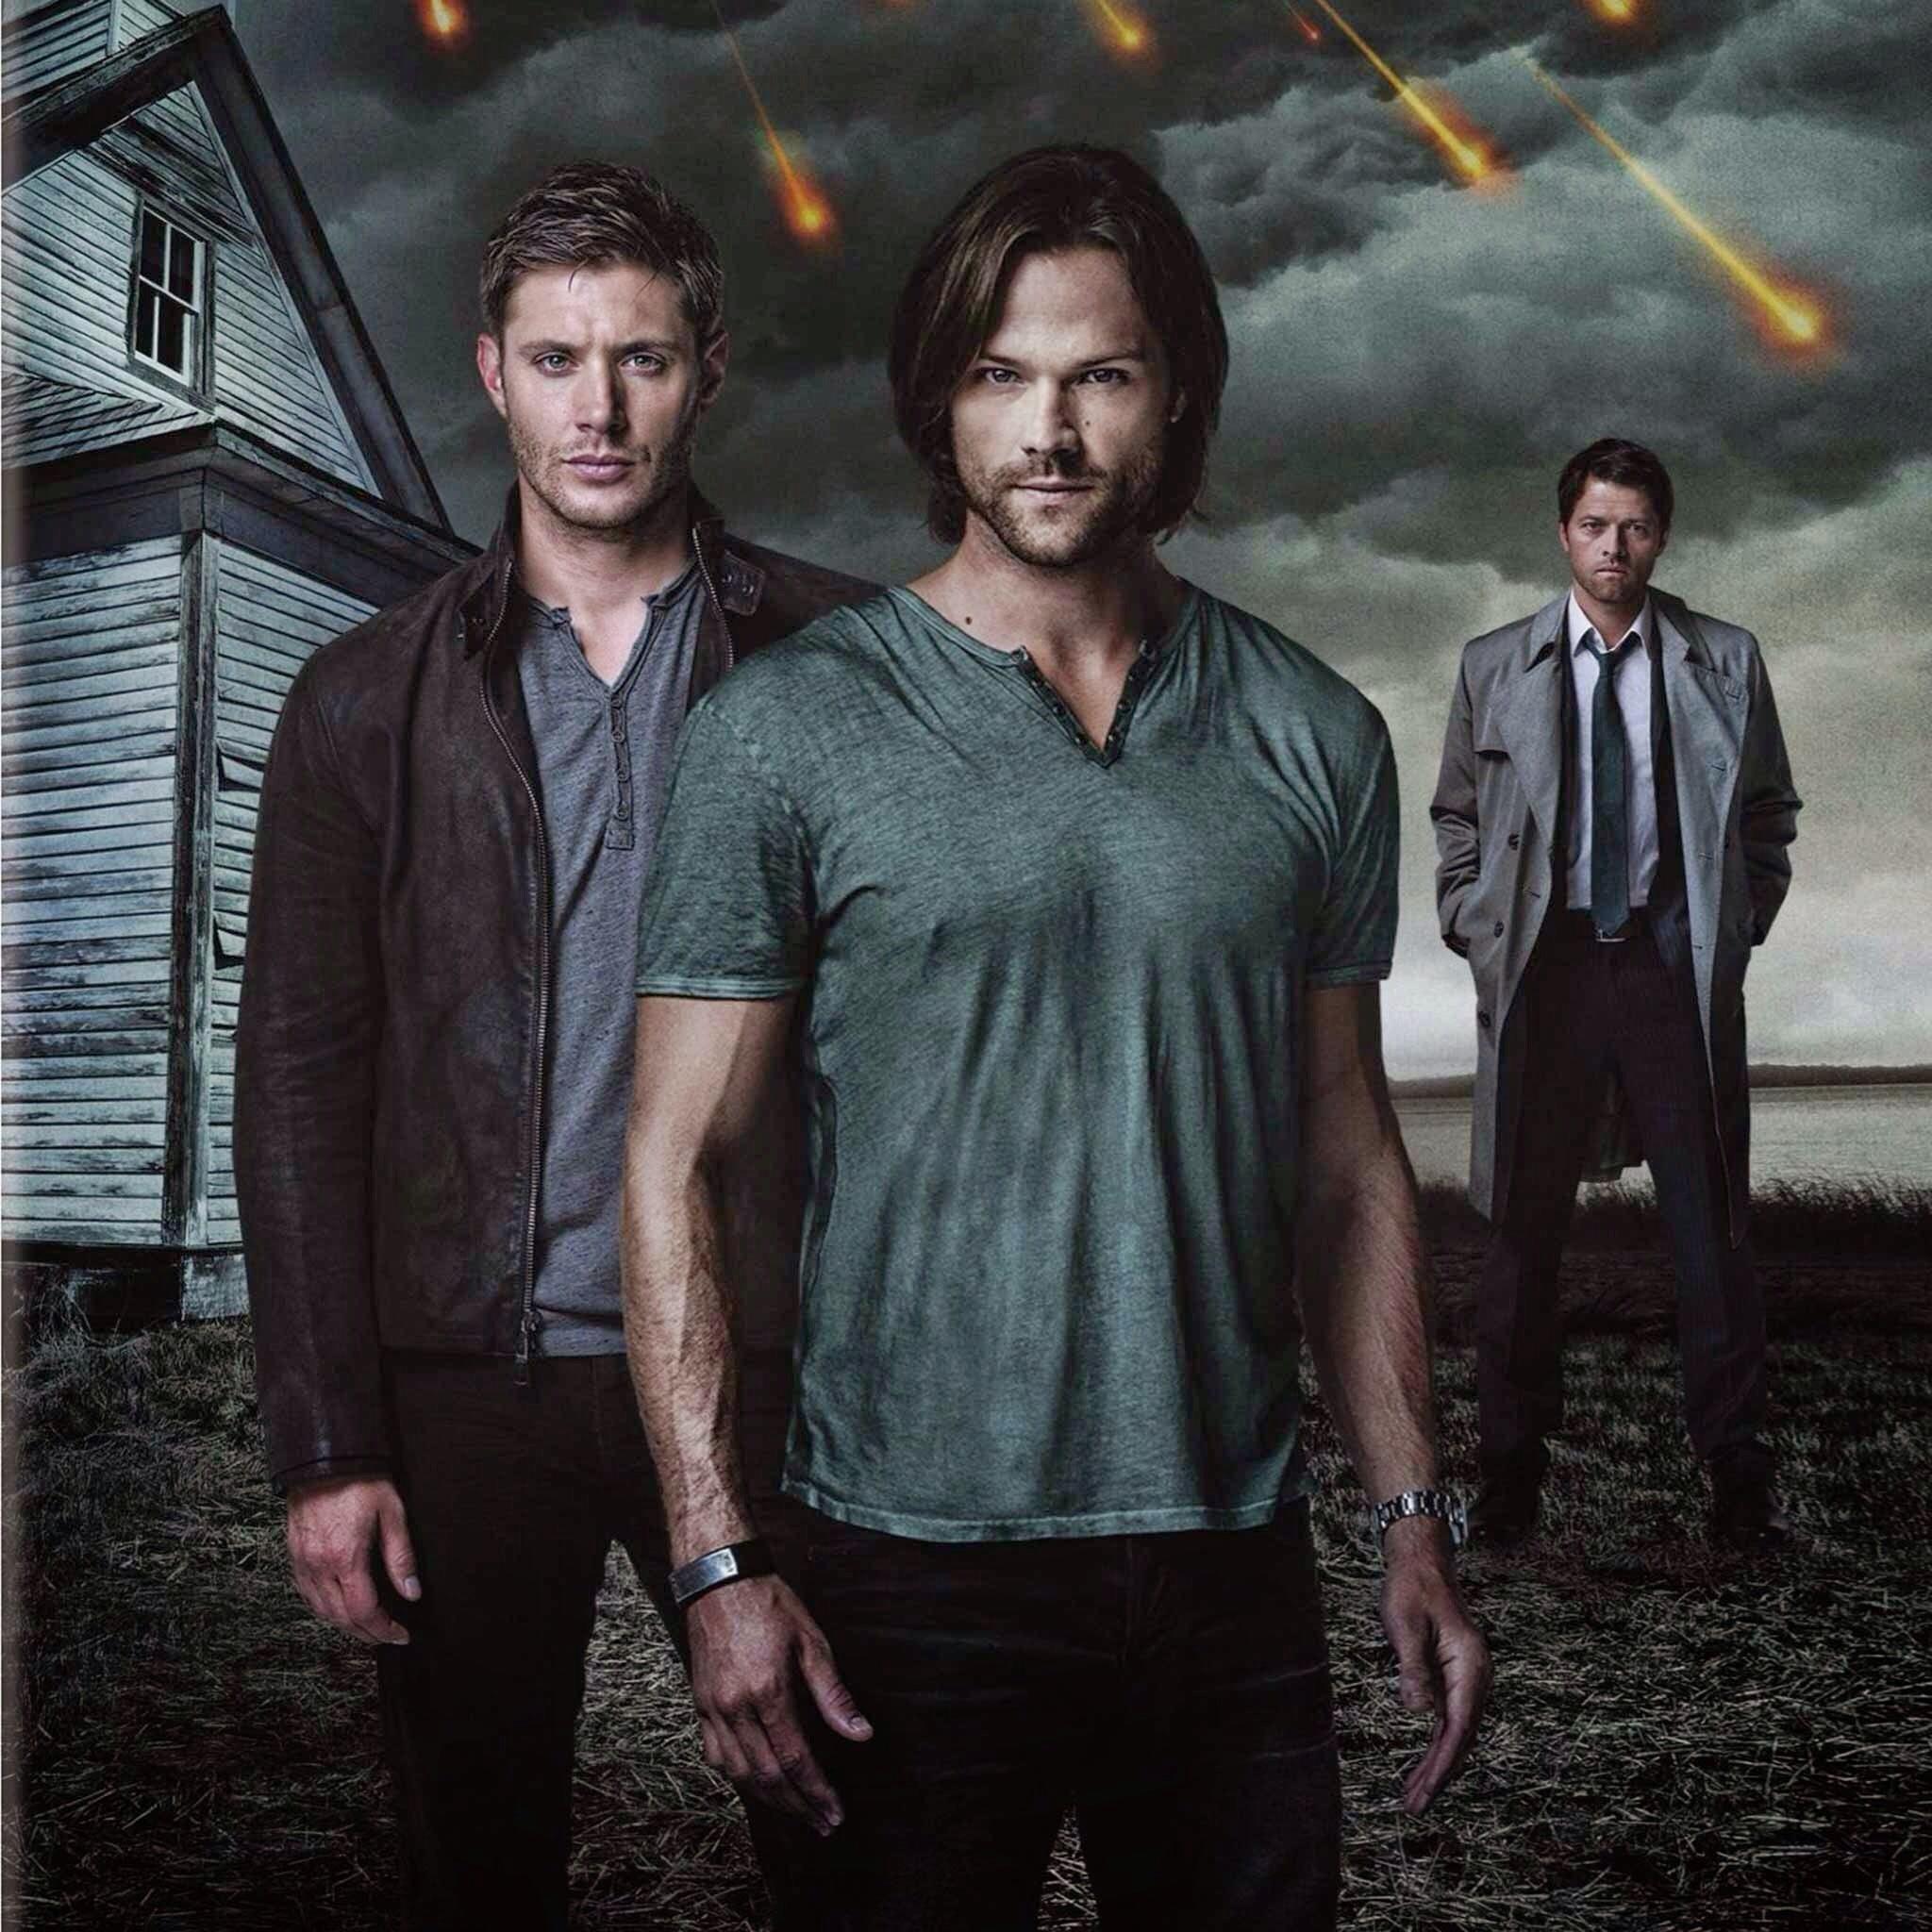 Dean, Sam, and Castiel